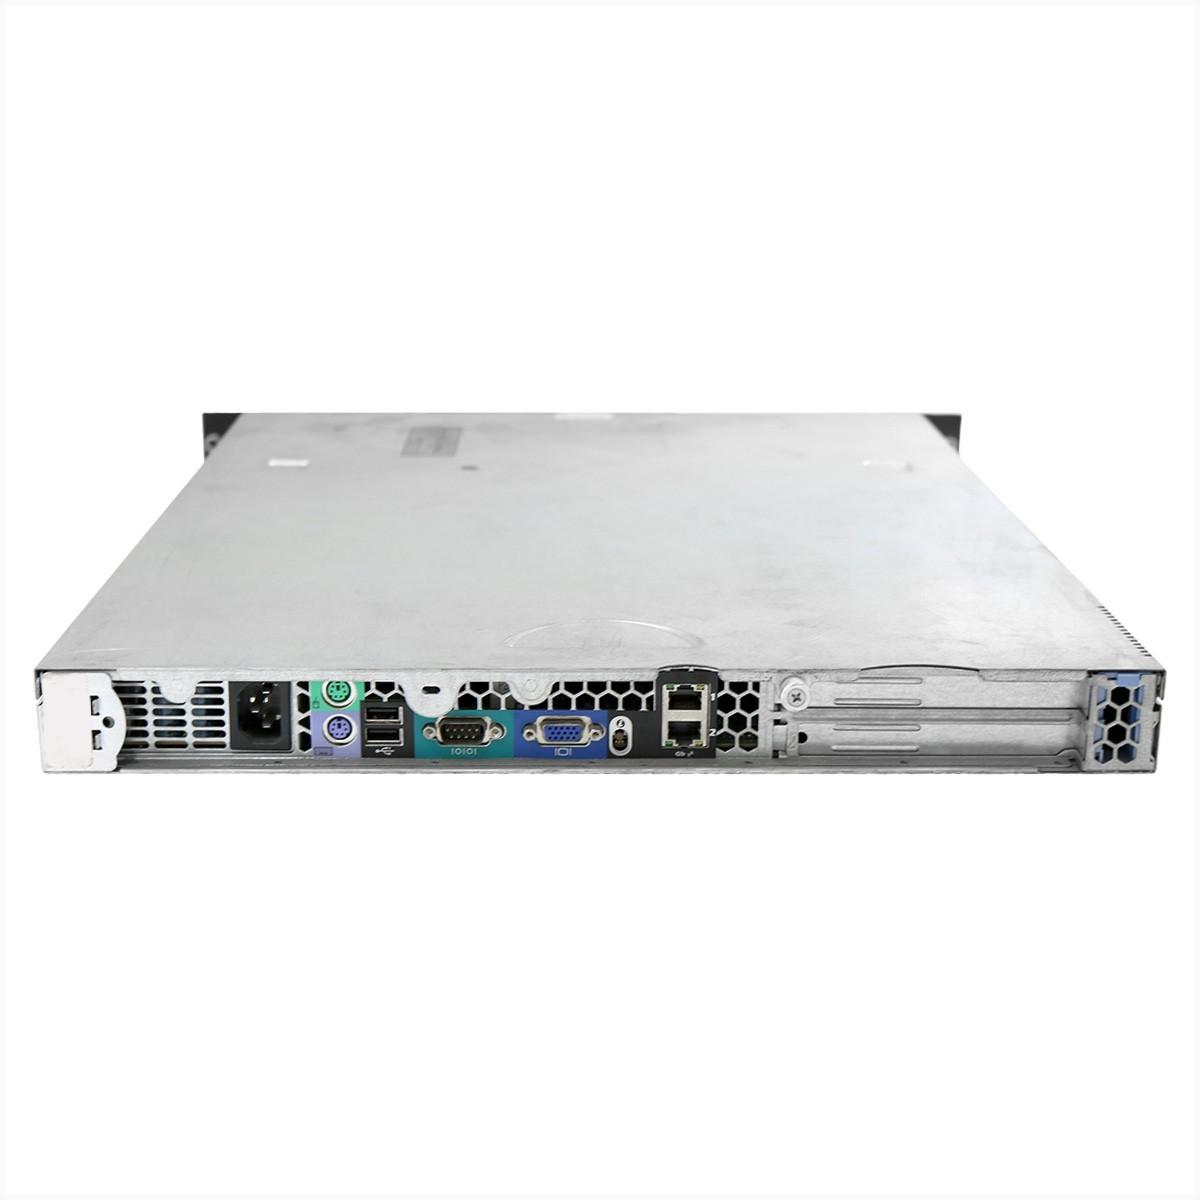 Servidor dell r200  xeon x3220 2gb 1tb - usado